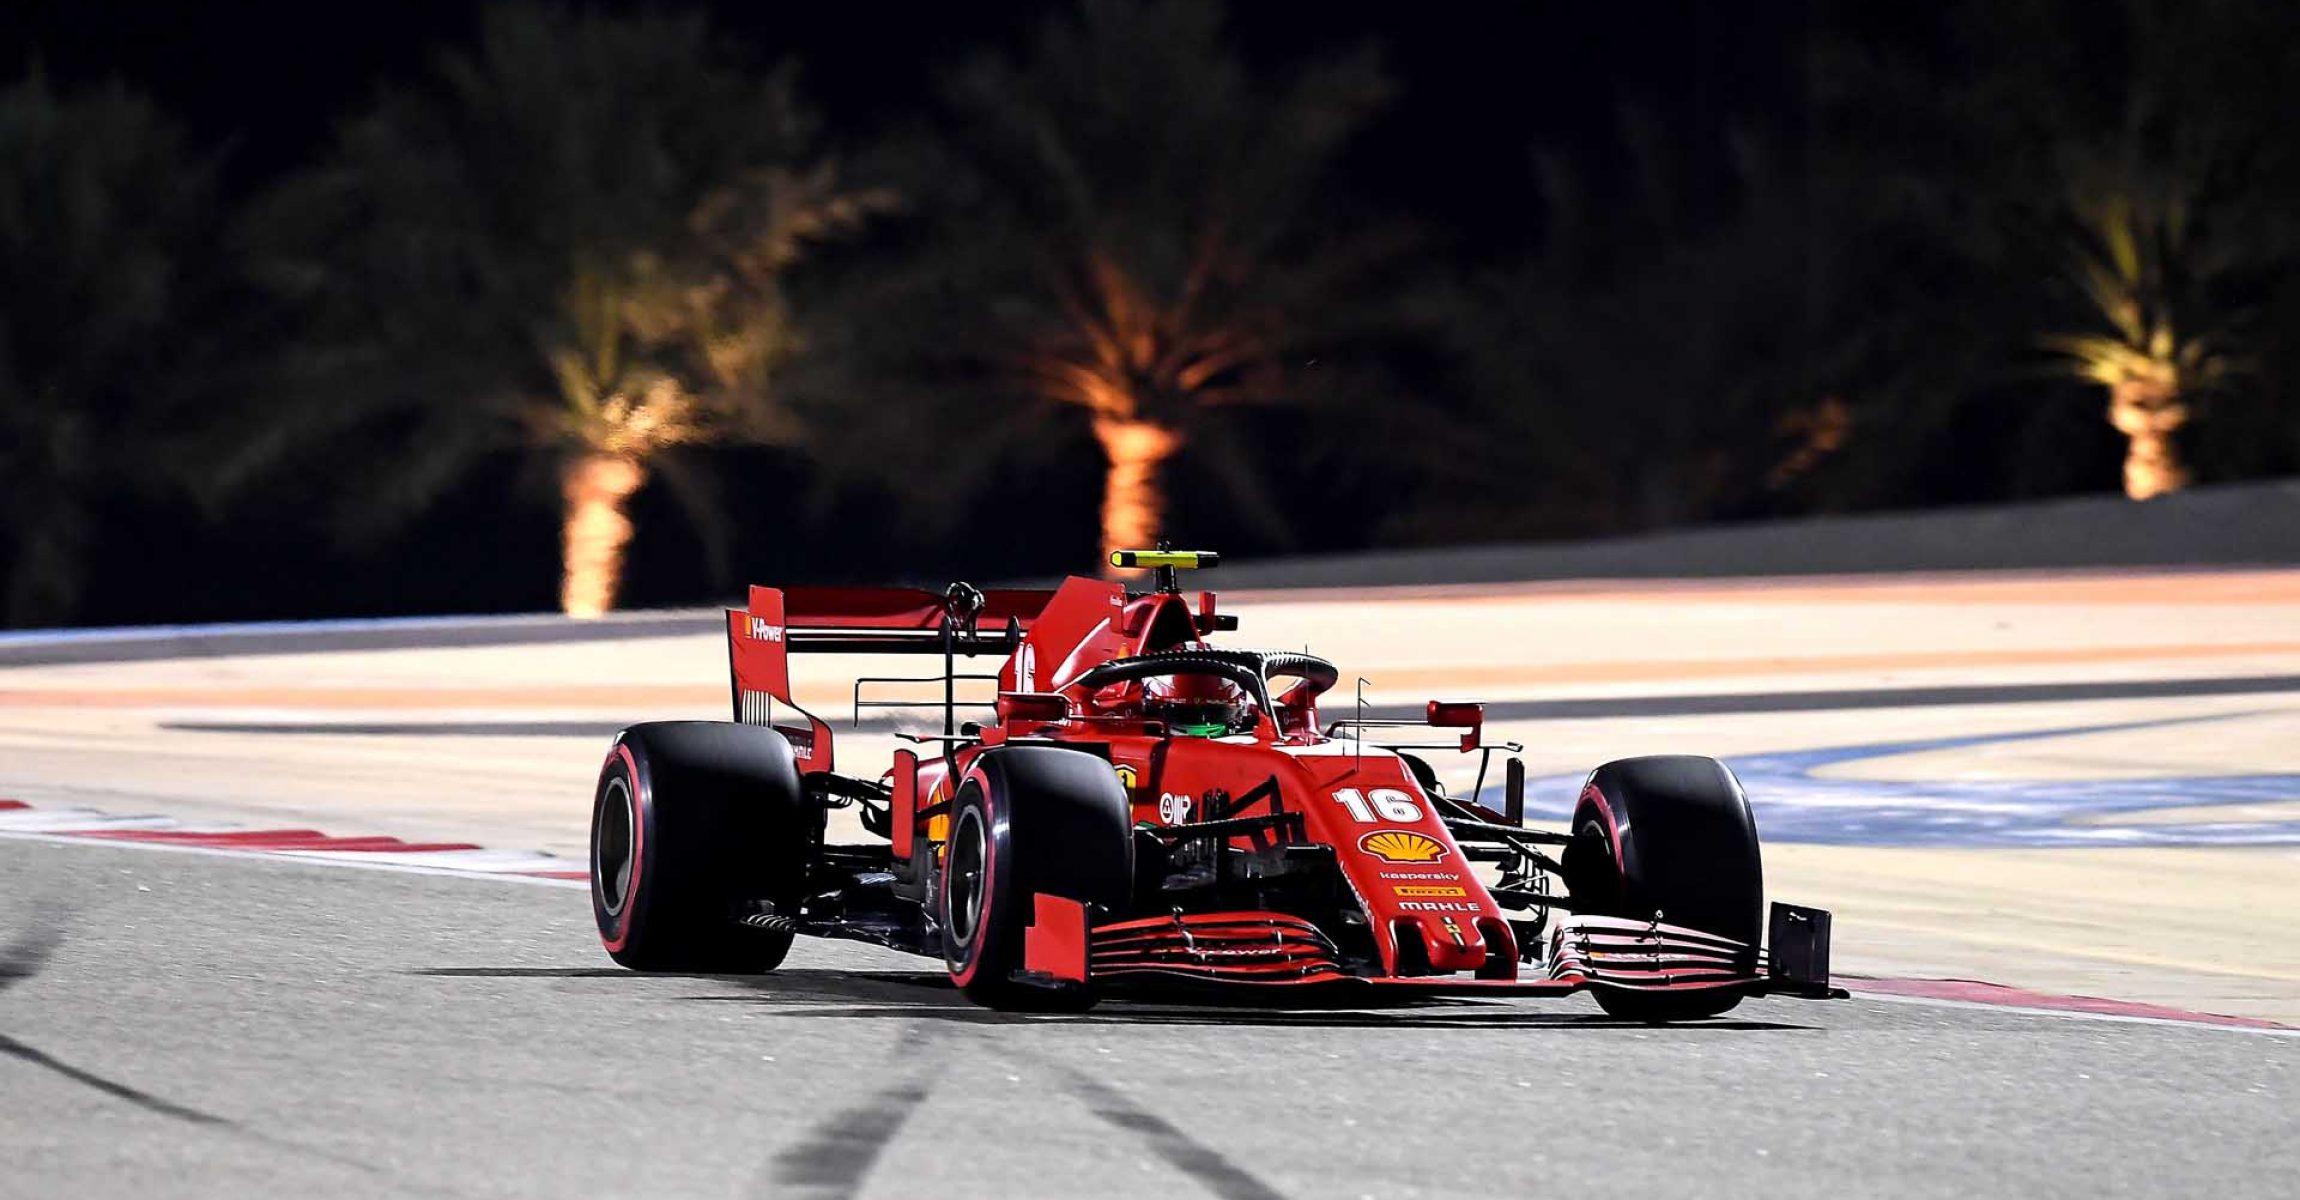 GP SAKHIR  F1/2020 - SABATO 05/12/2020   credit: @Scuderia Ferrari Press Office Charles Leclerc